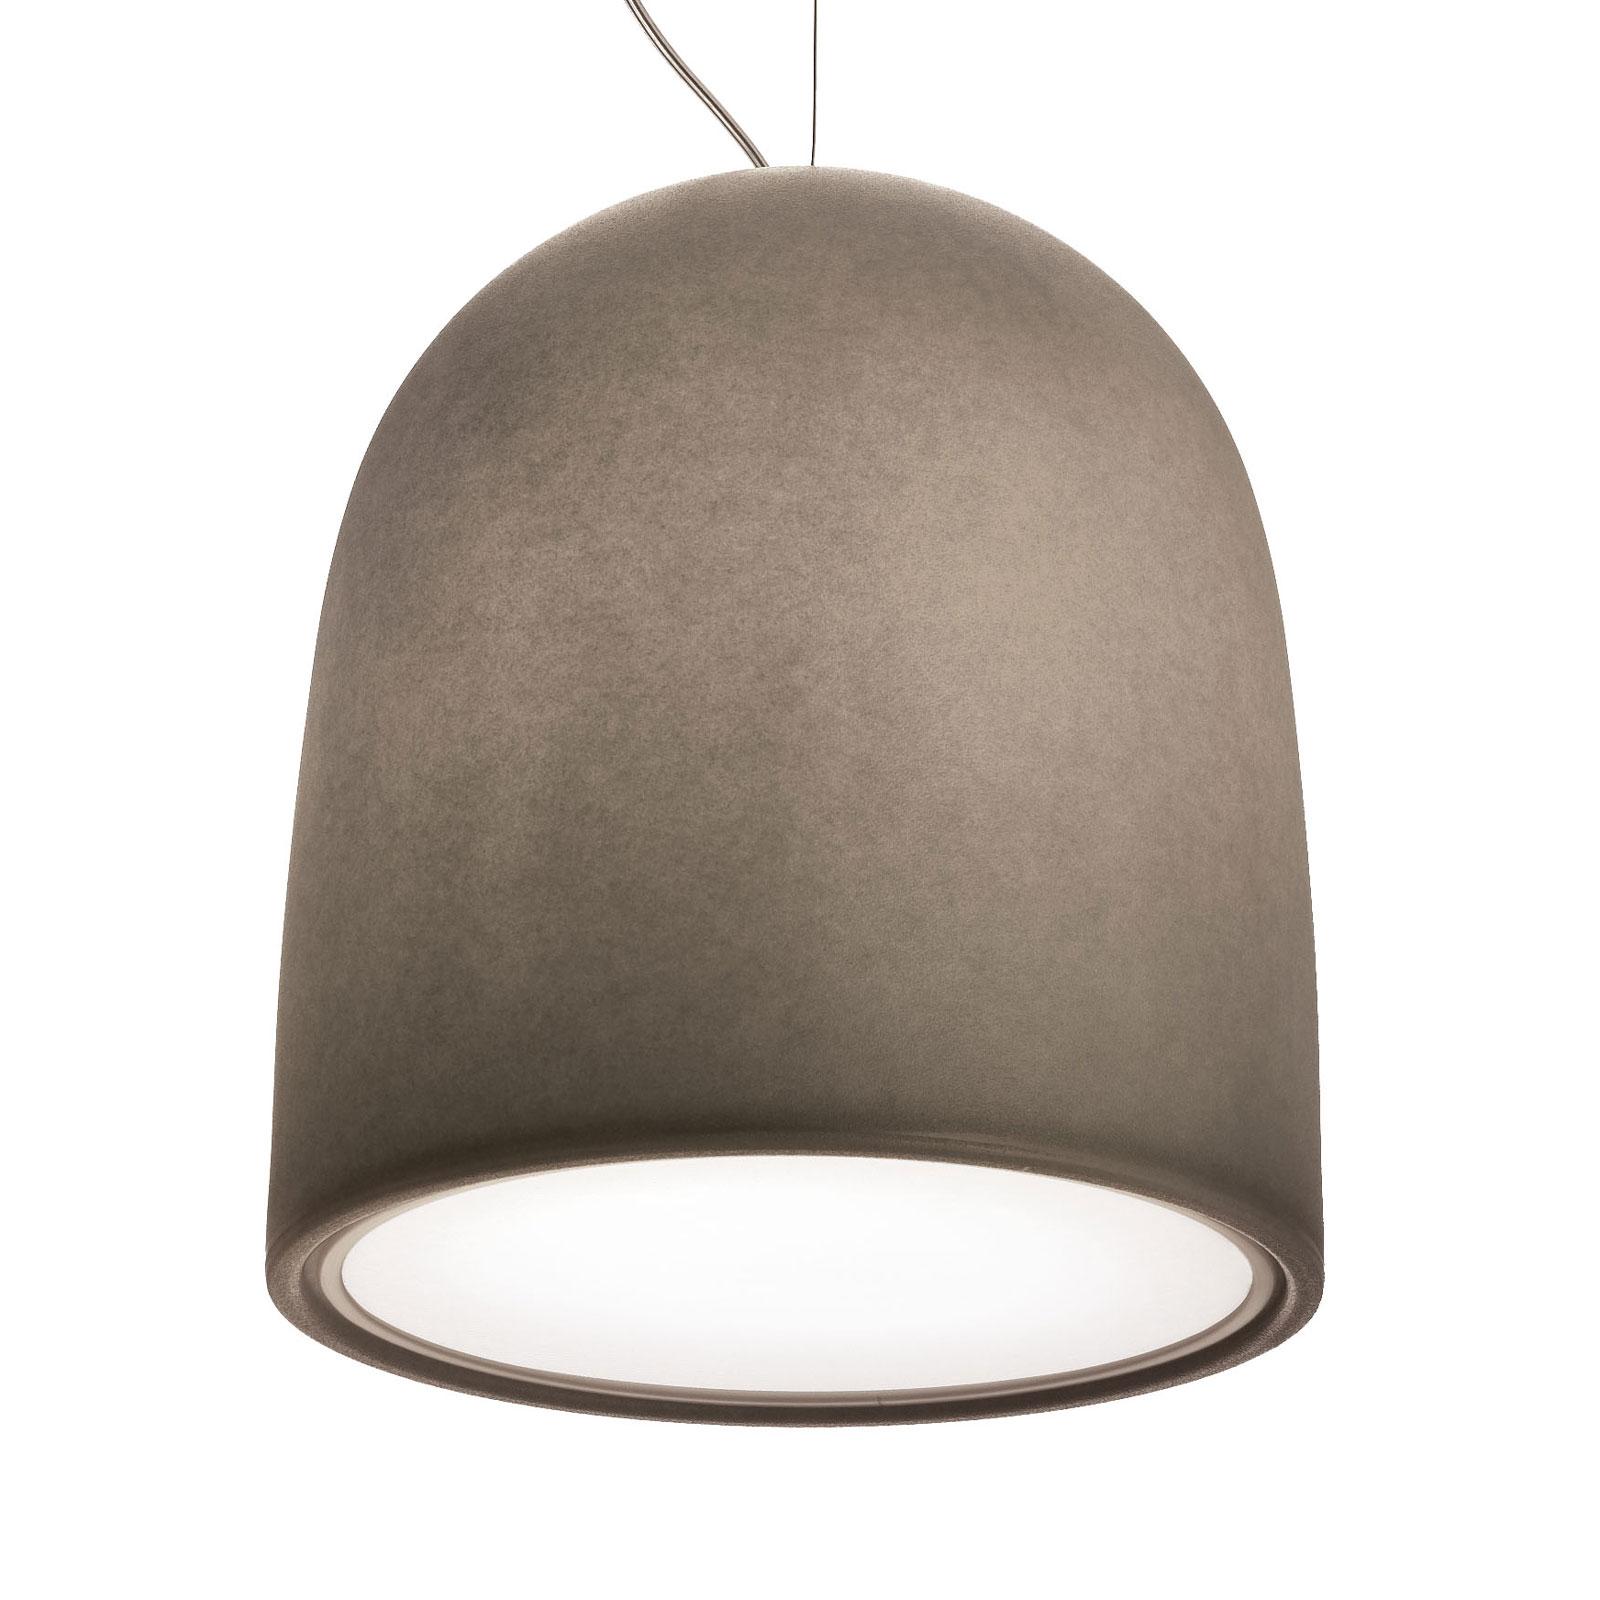 Modo Luce Campanone hanglamp Ø 51 cm donkergrijs